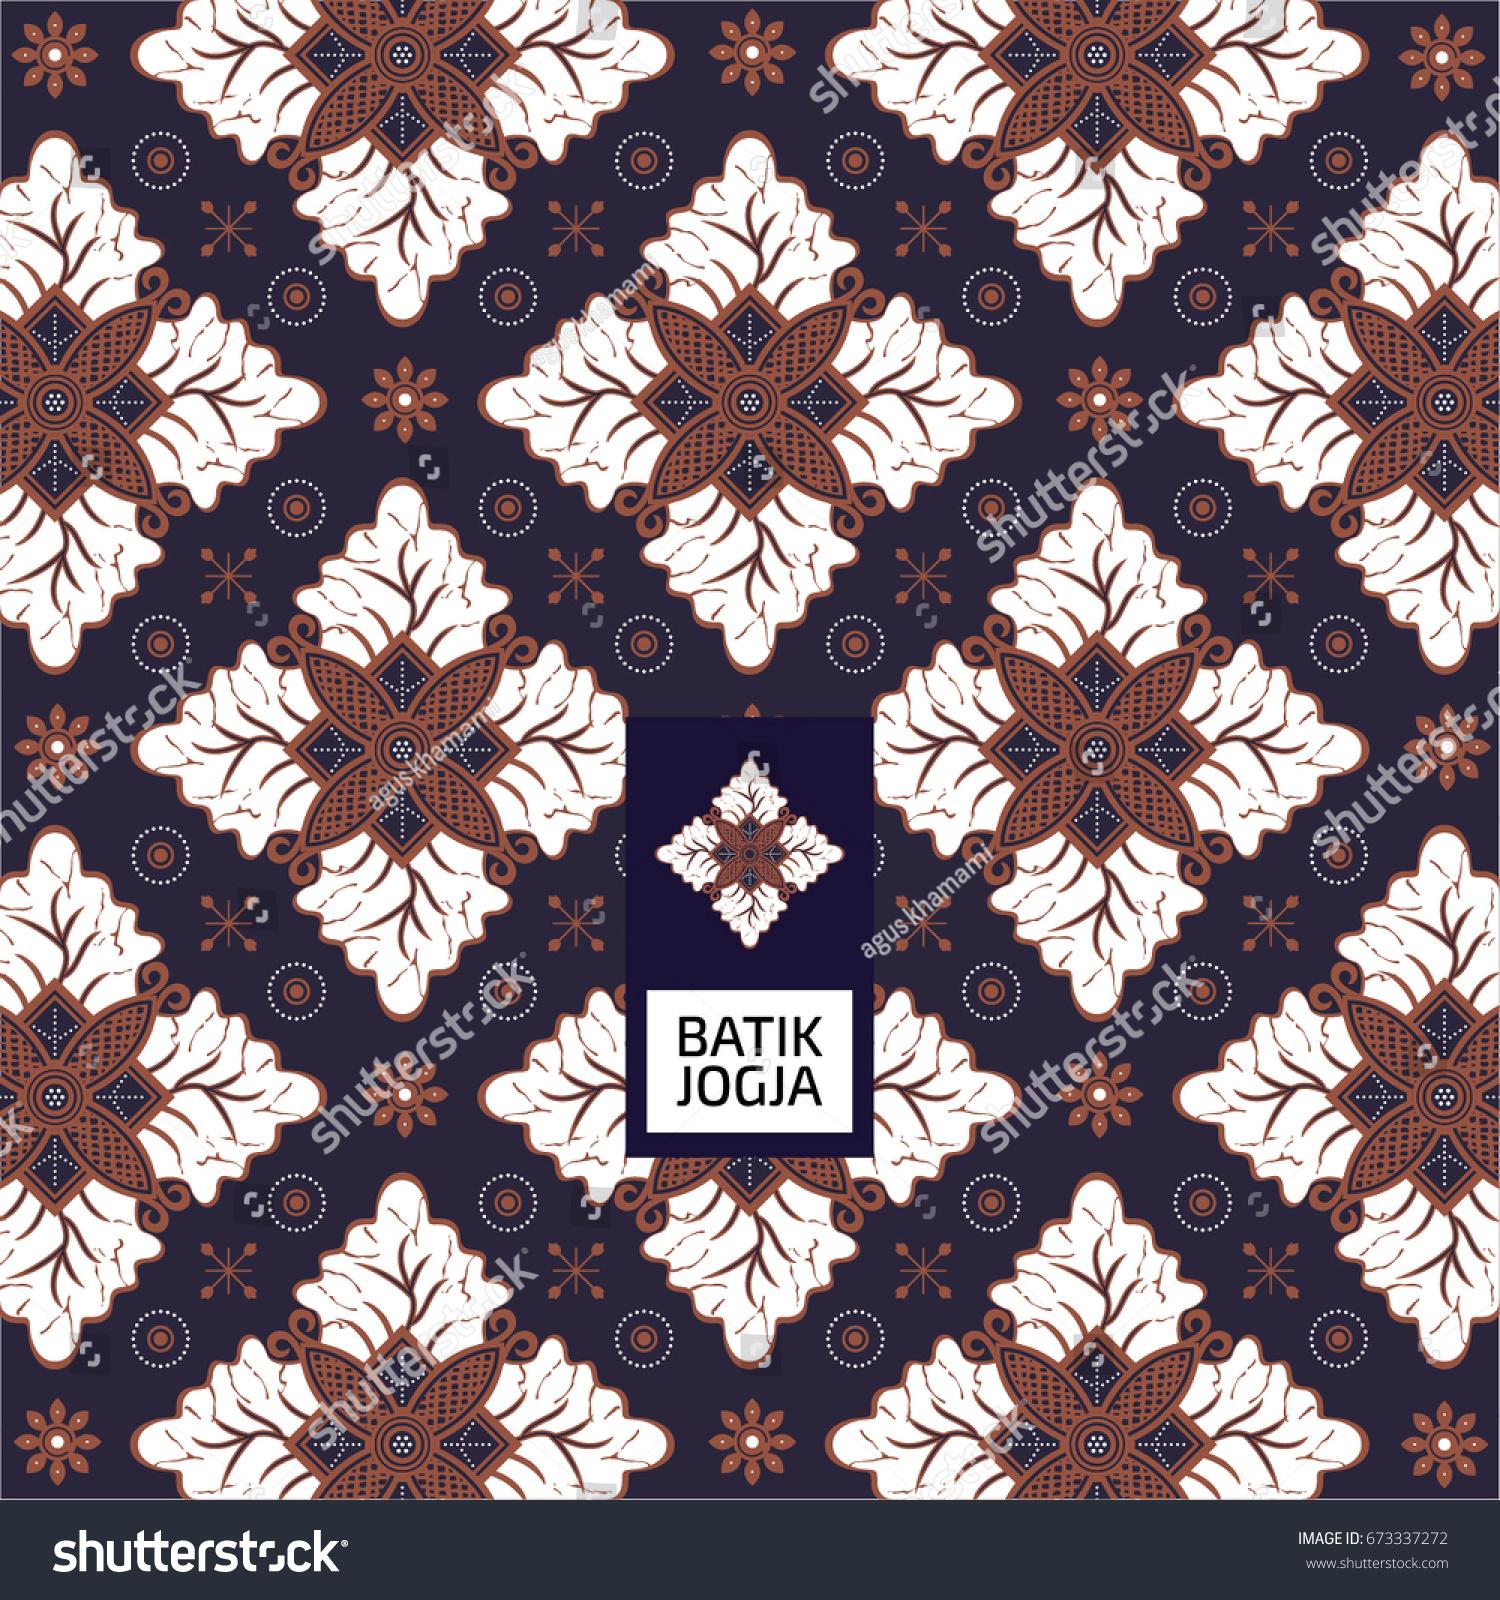 Batik Jogja Pattern Stock Vector 673337272